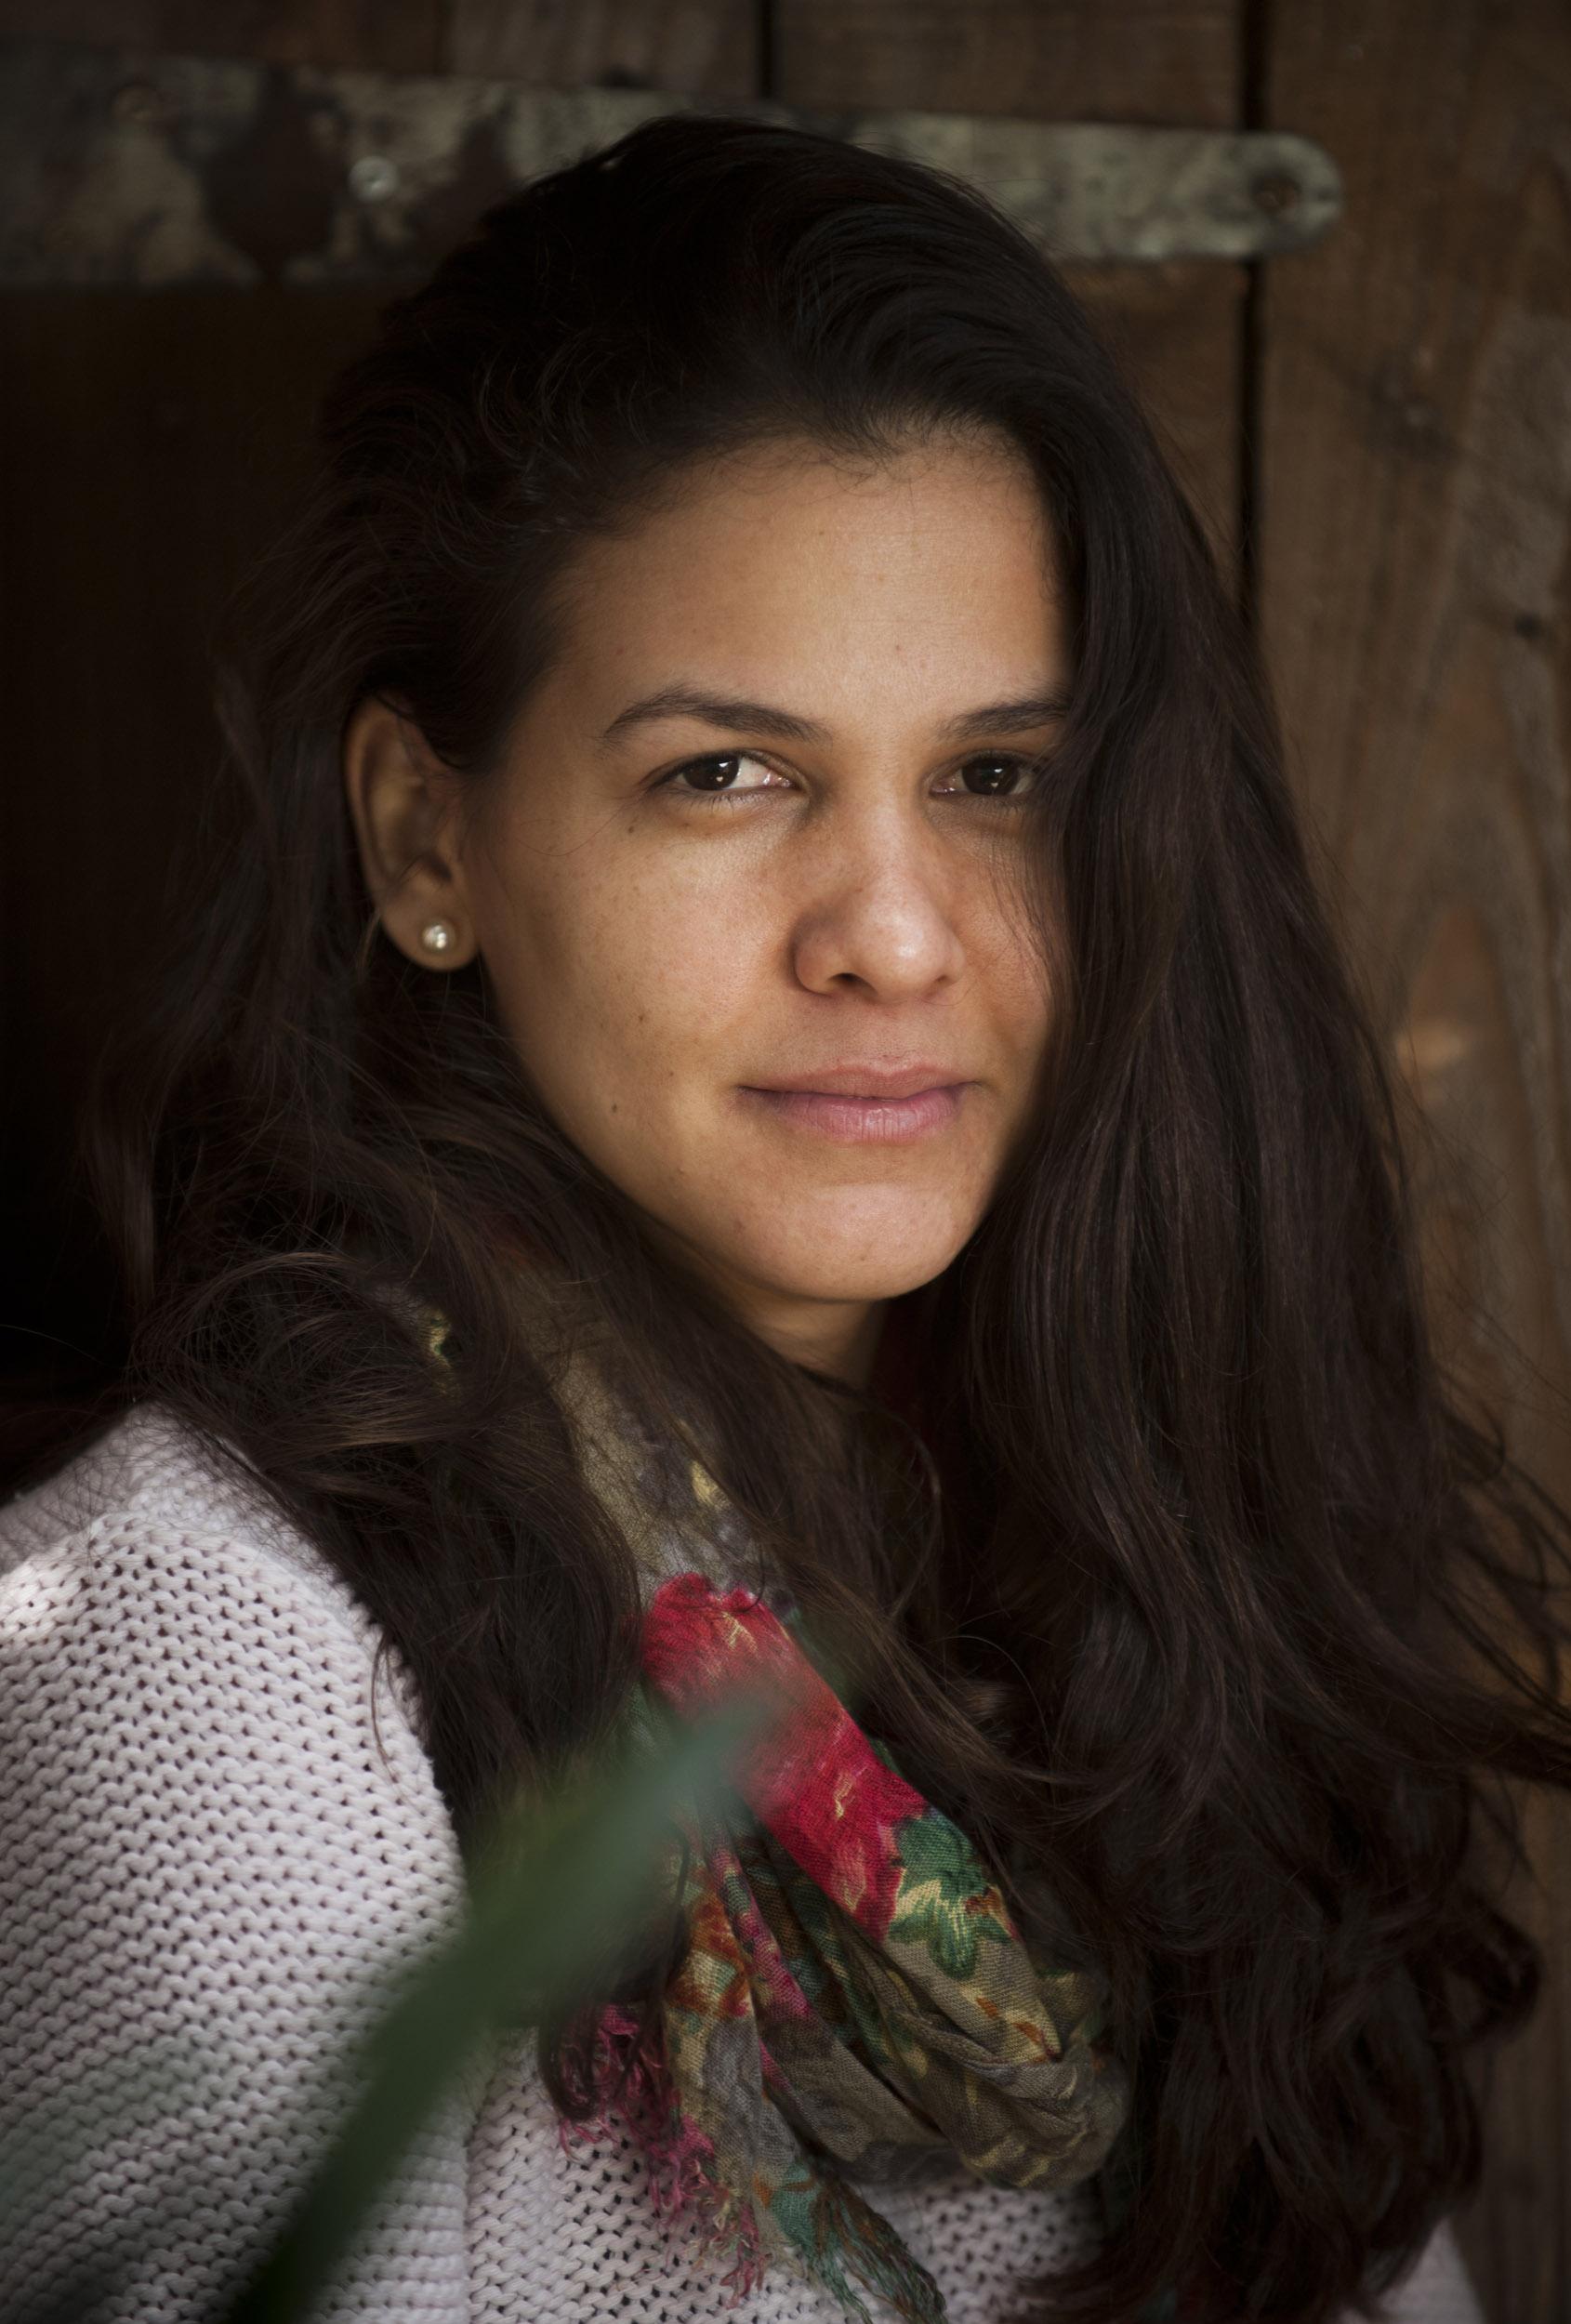 Jessica Rodríguez, filmmaker - Illuminated Cuba - Hector Garrido, Aerial and human photography